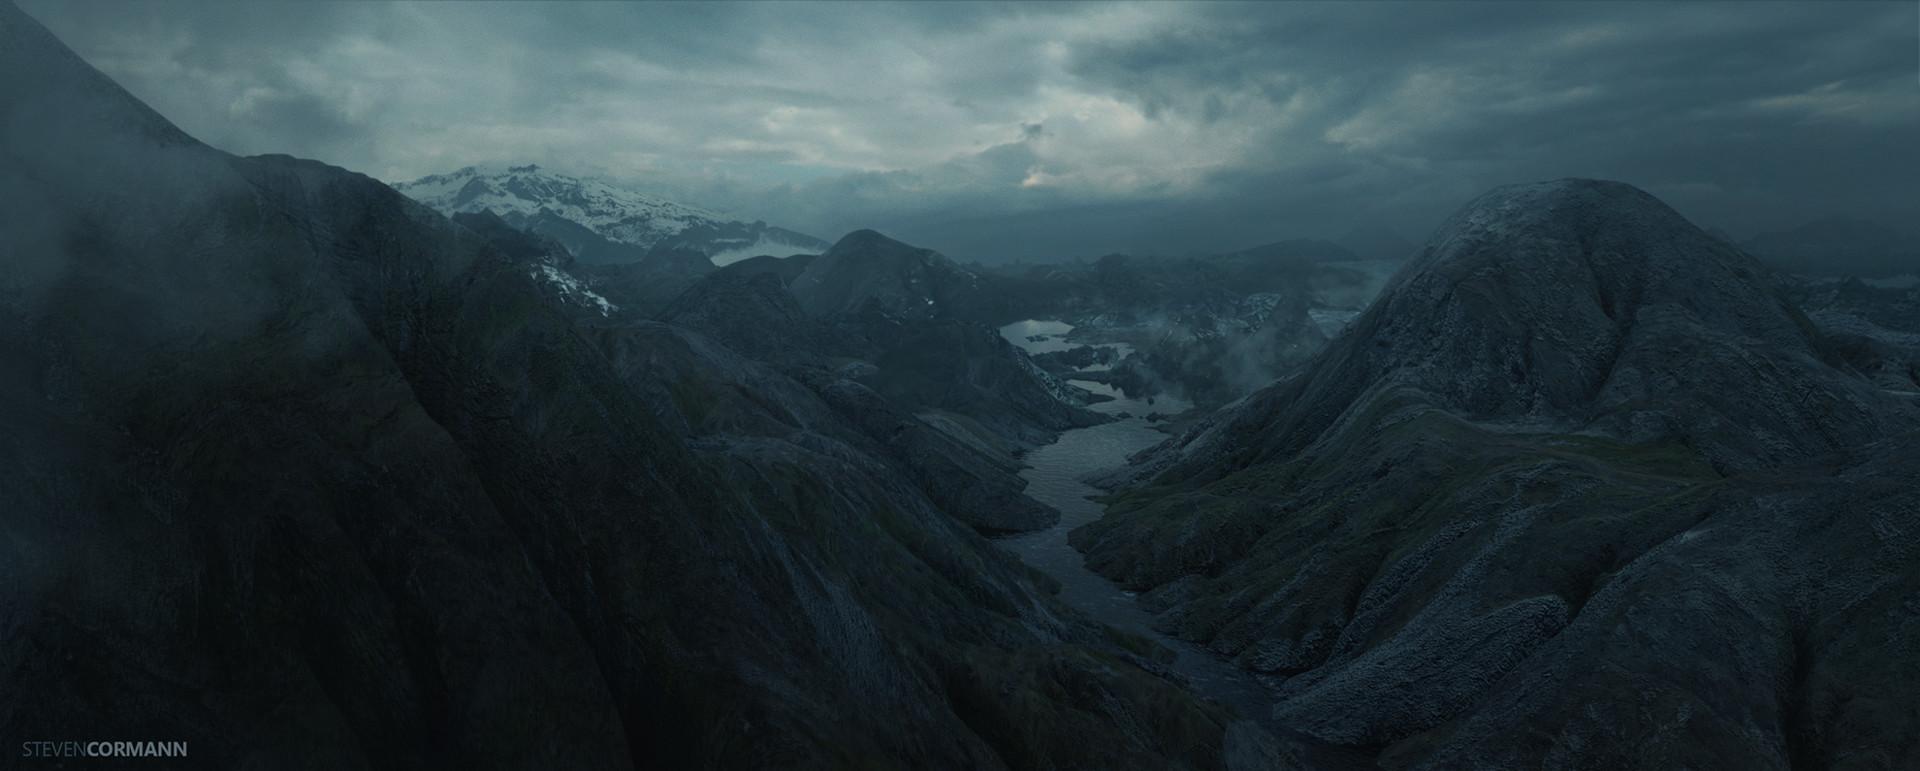 steven-cormann-landscape01